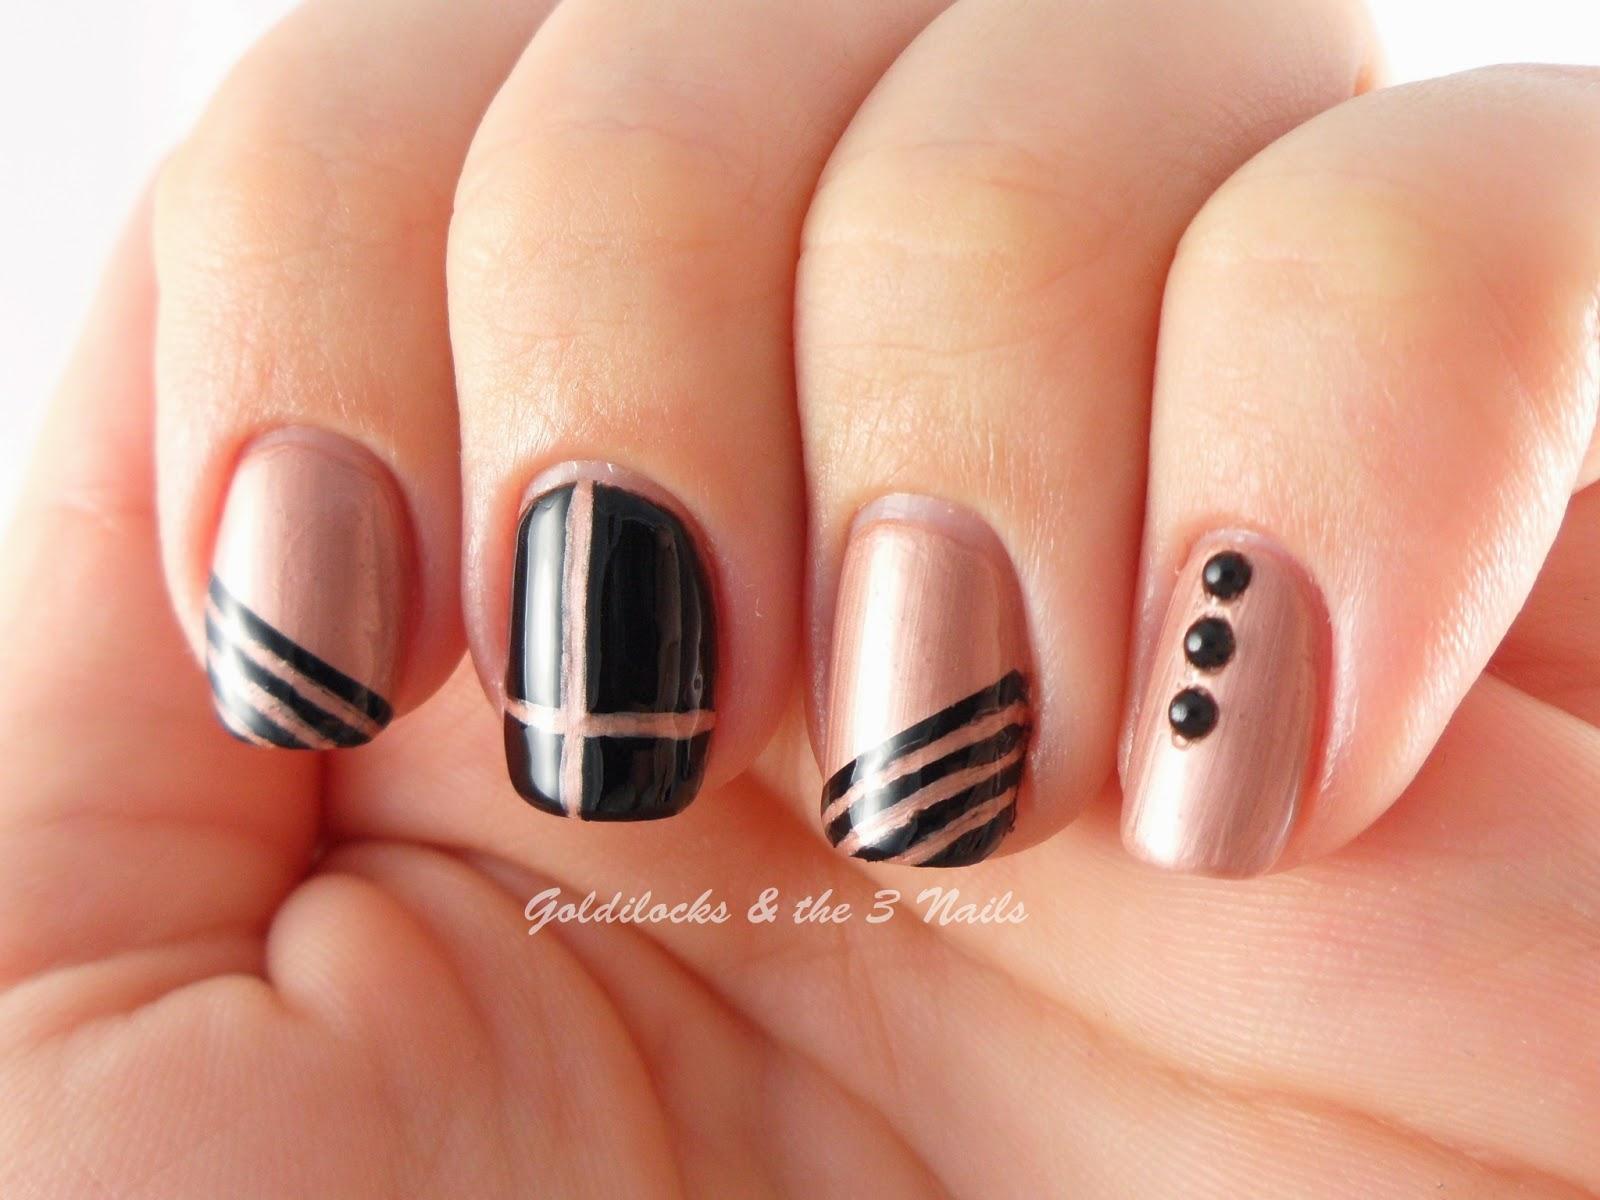 Orly Nail Art Kitharingtonweb